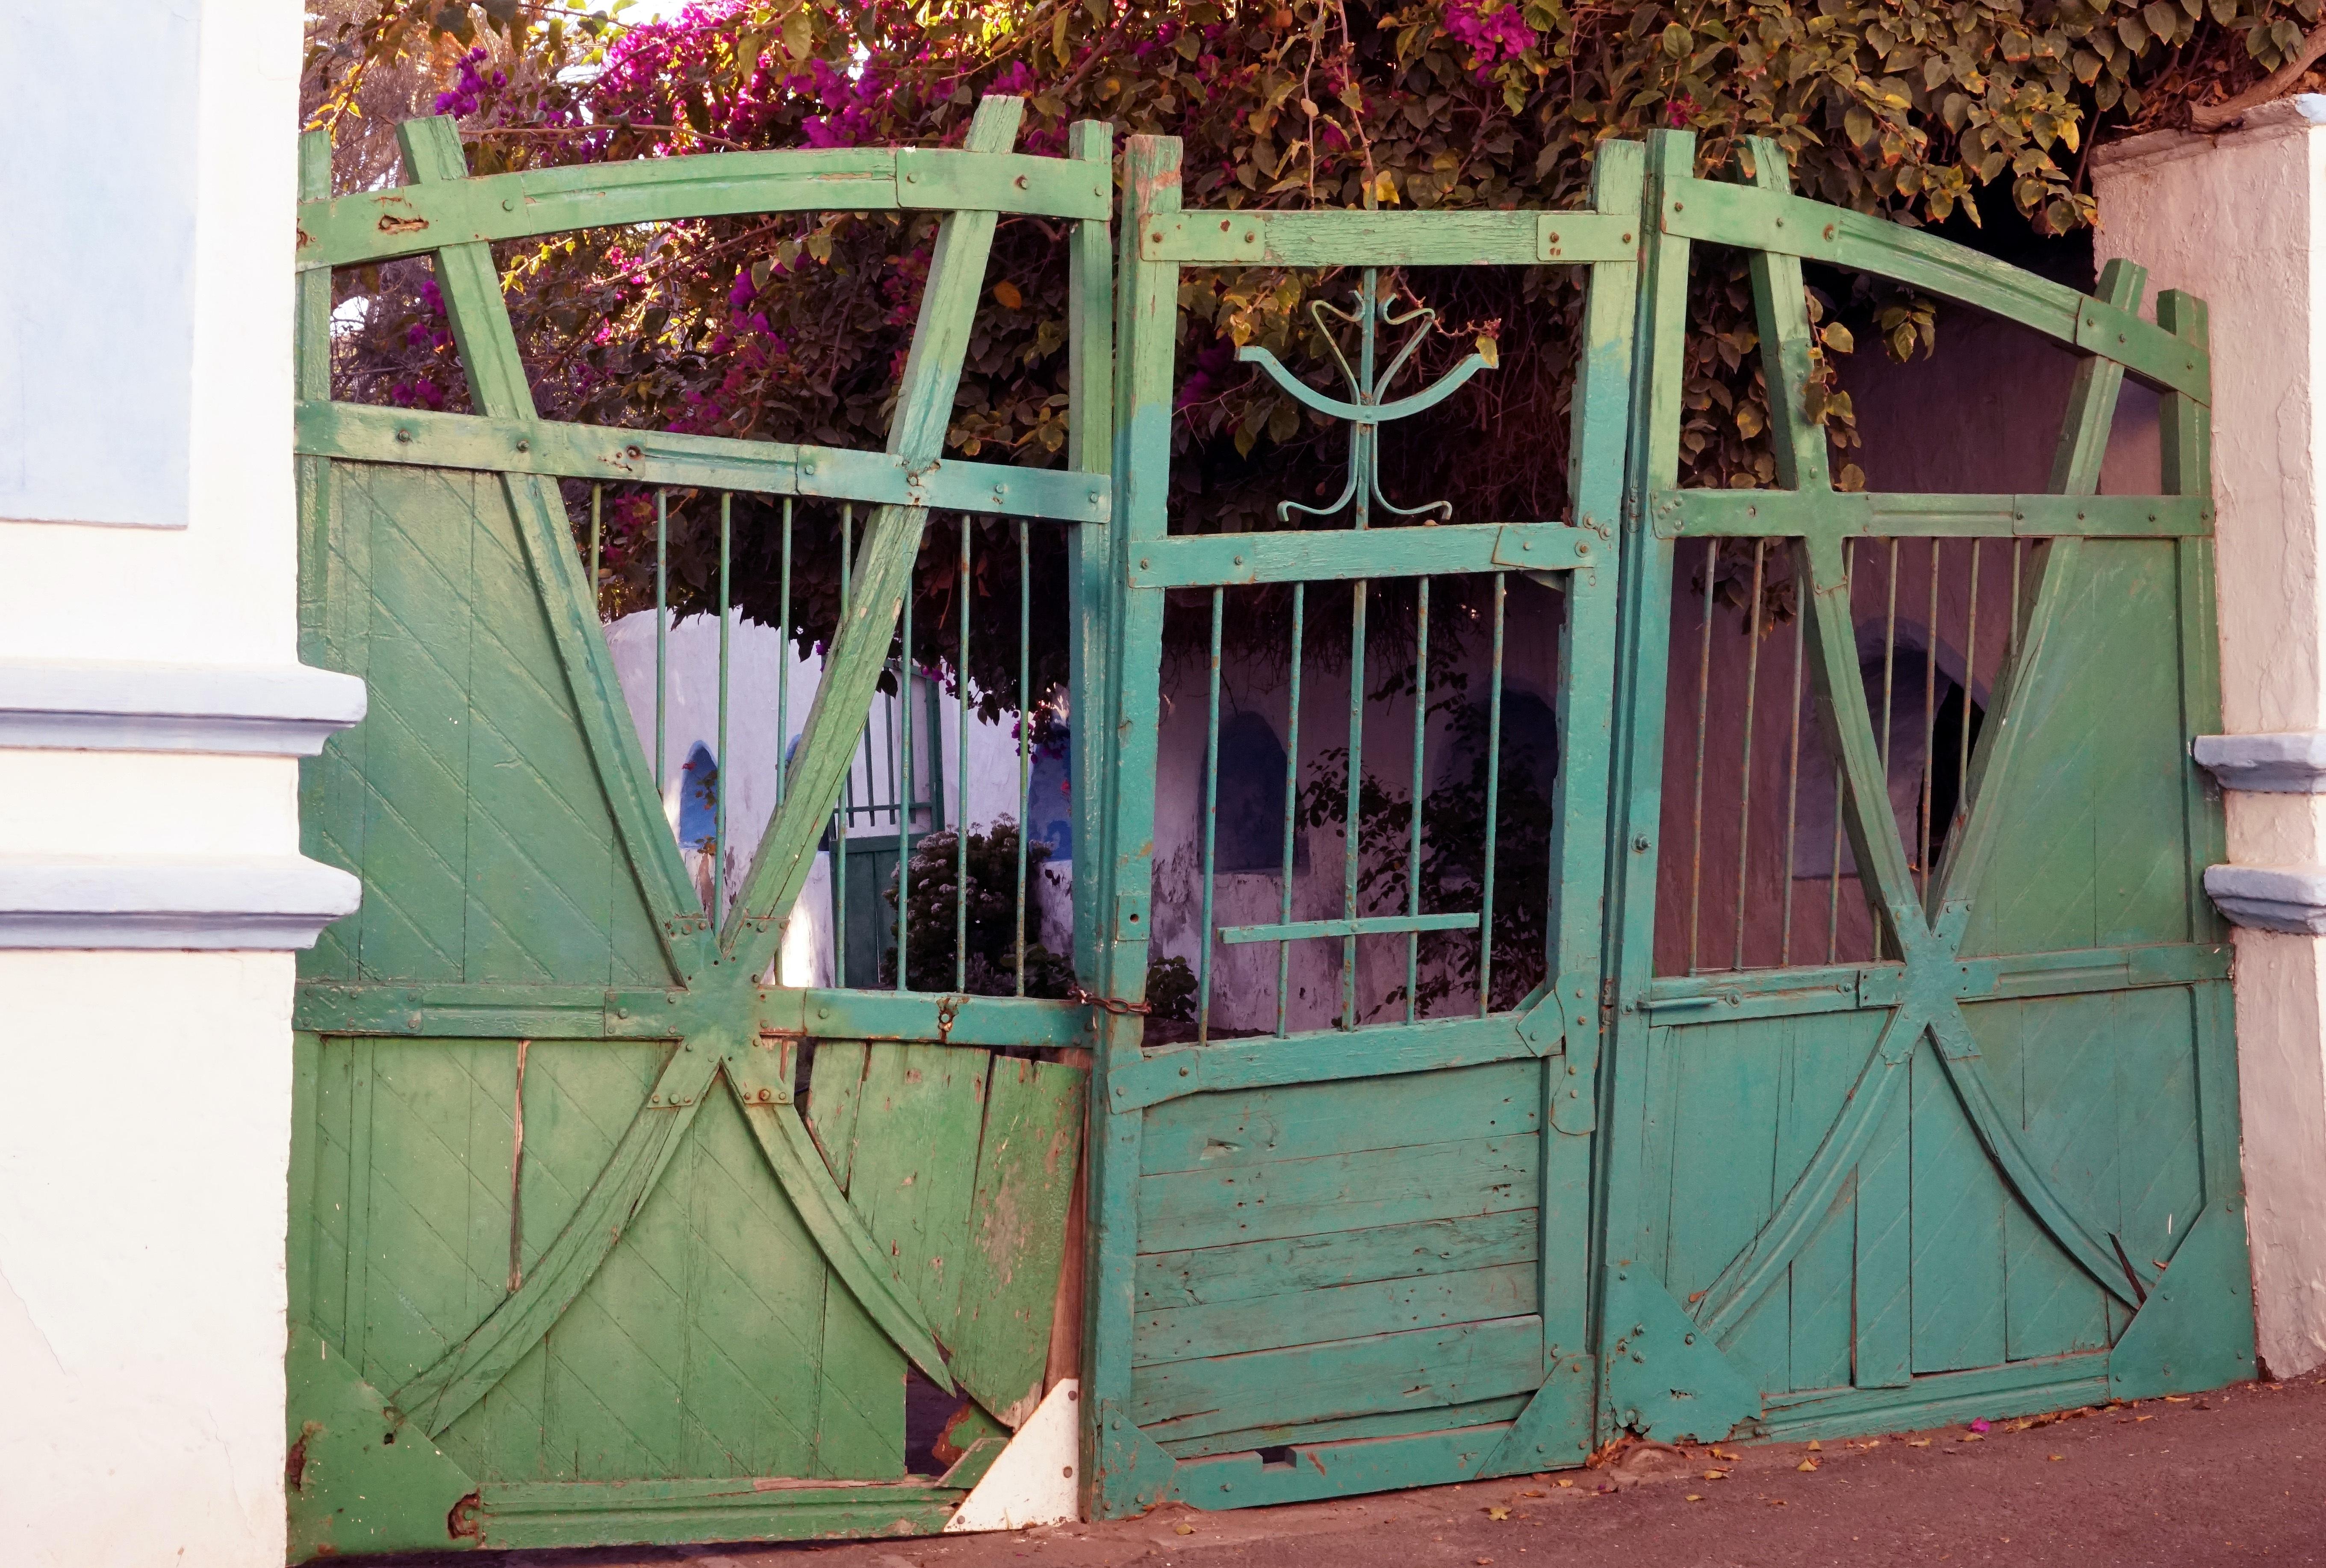 Fotos gratis : madera, casa, ventana, antiguo, cobertizo, color ...